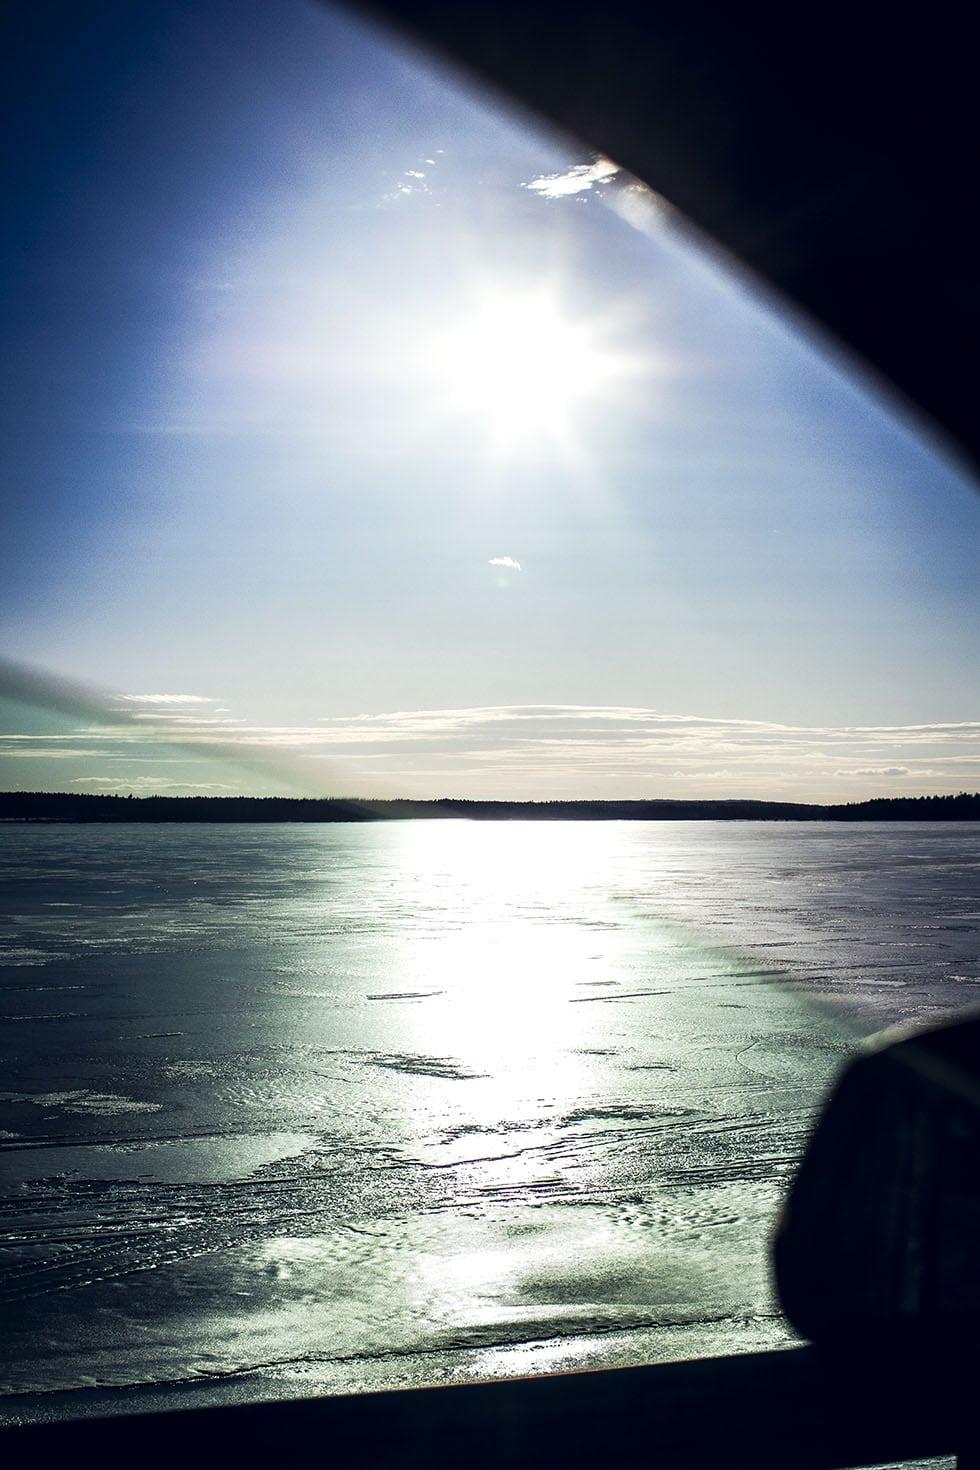 Galven Galvsjön